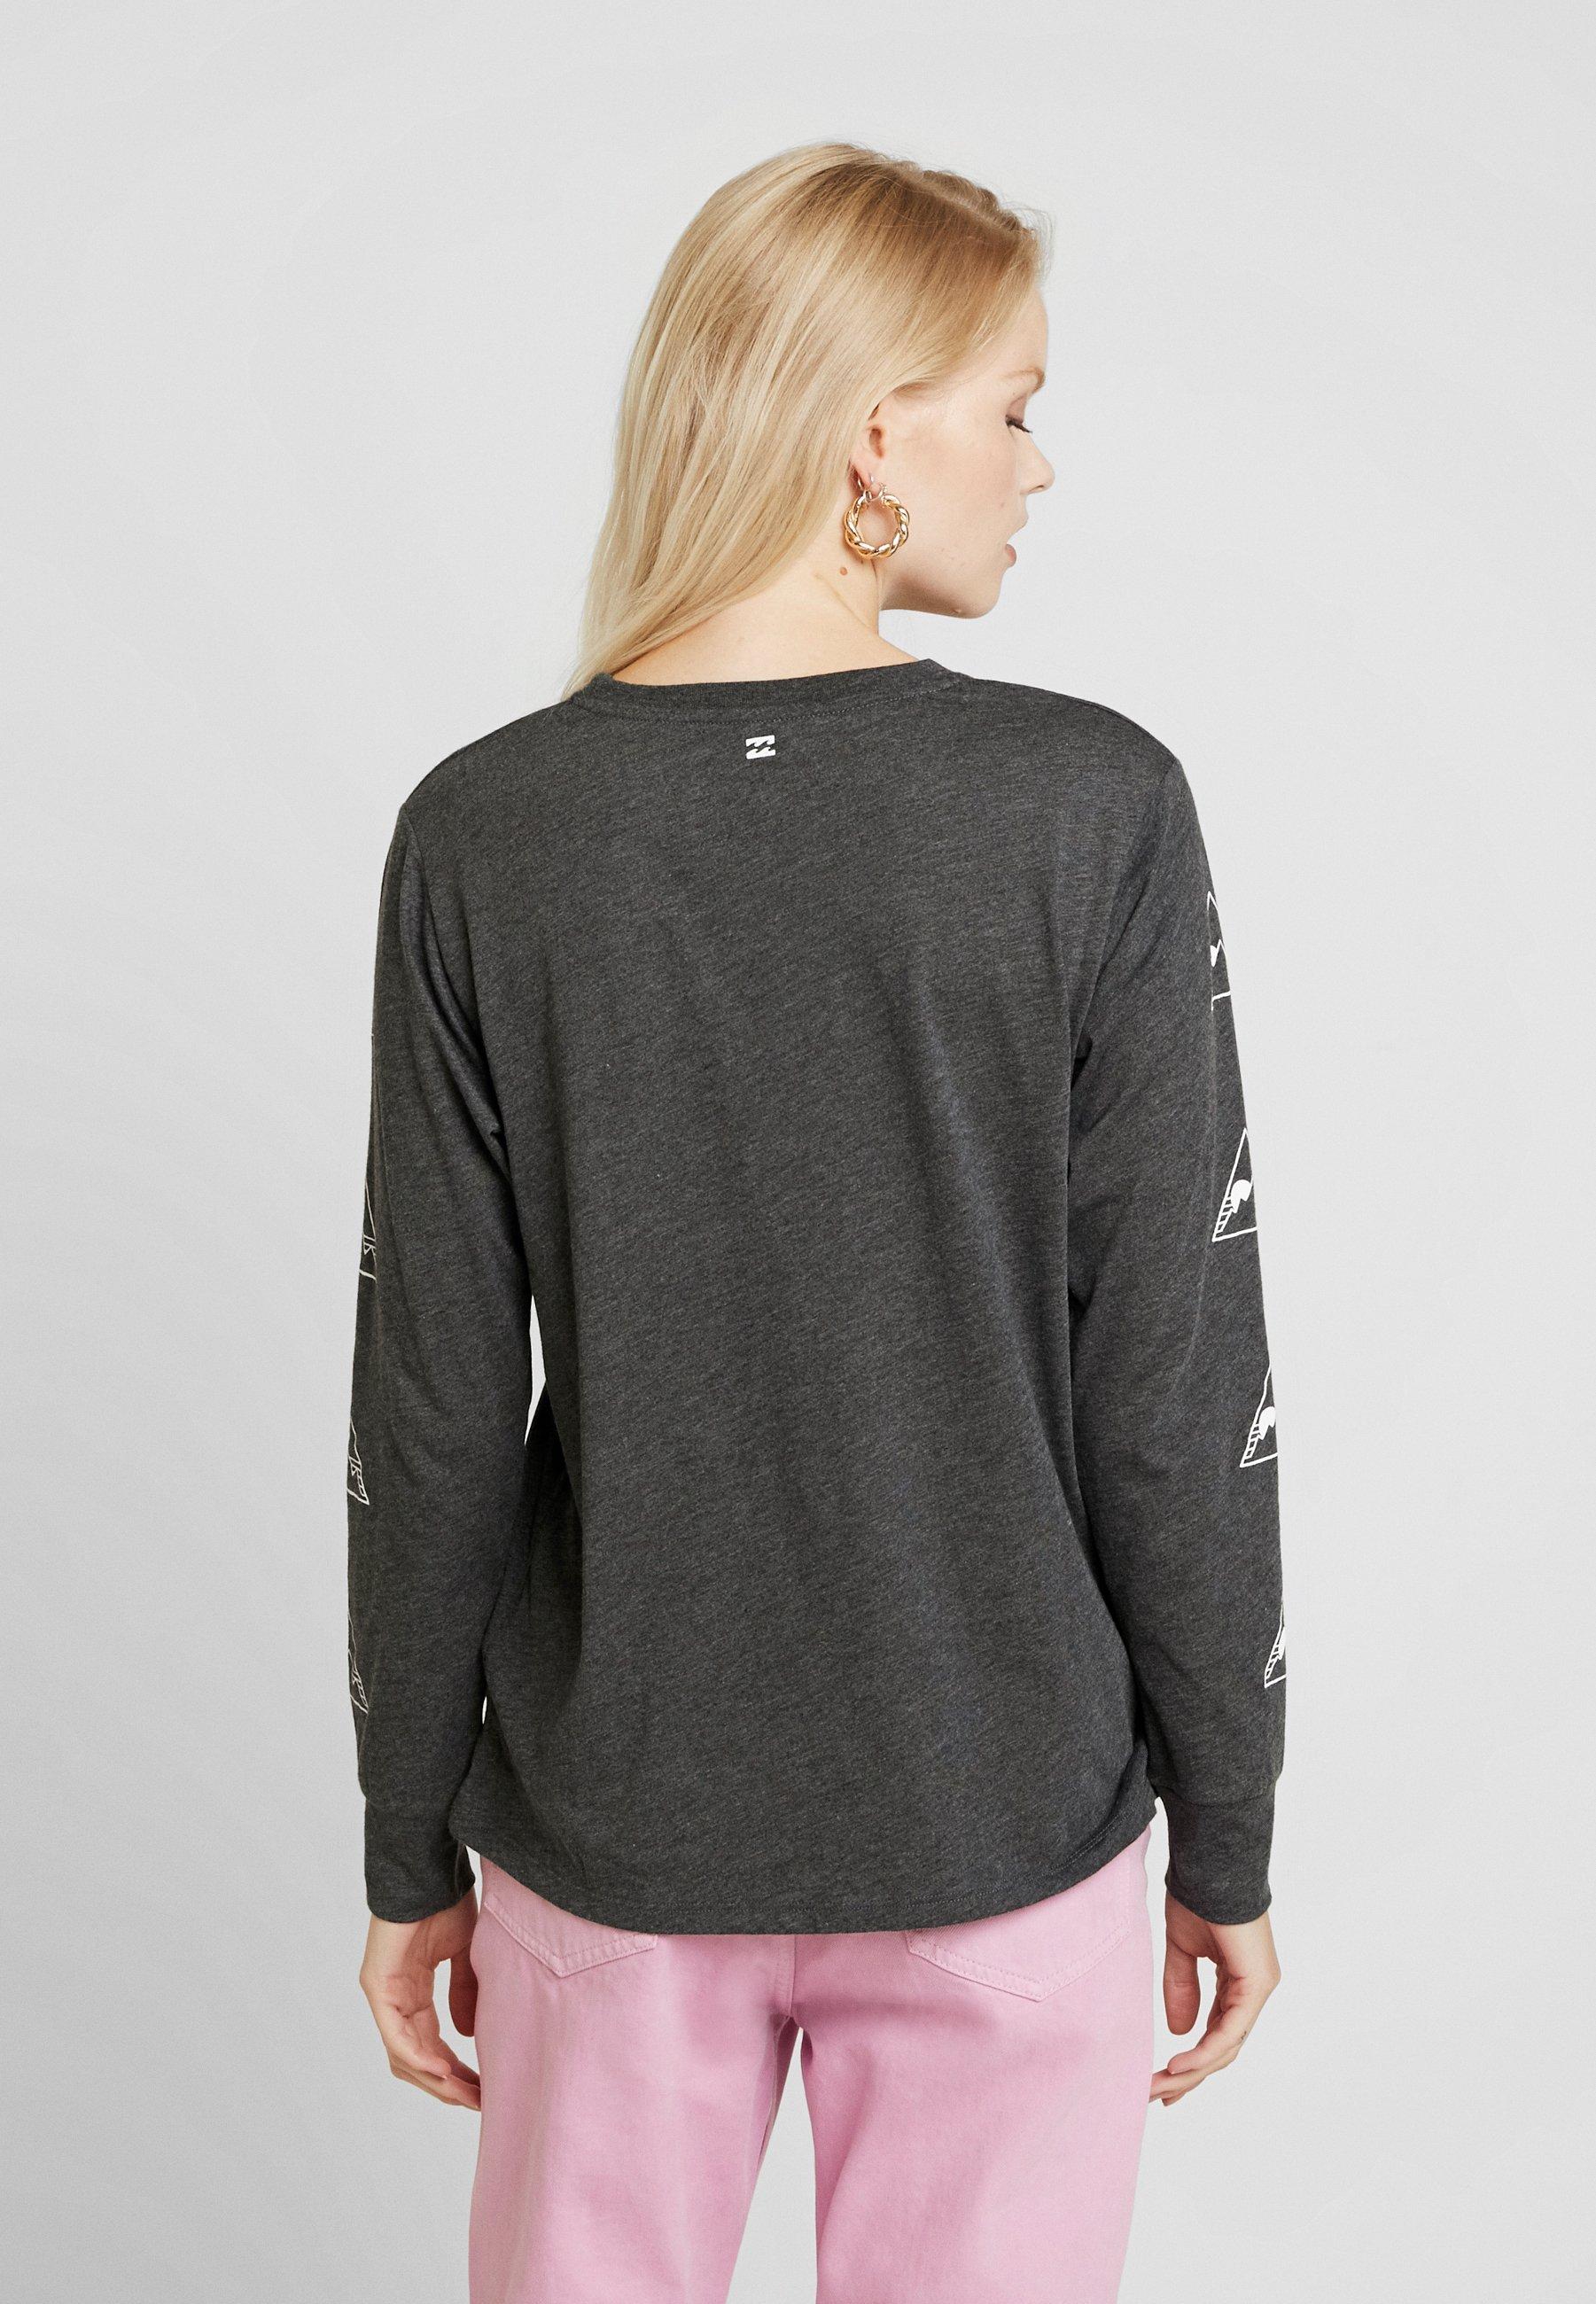 À Manches Longues Billabong shirt High TideT Black wk80OnPX